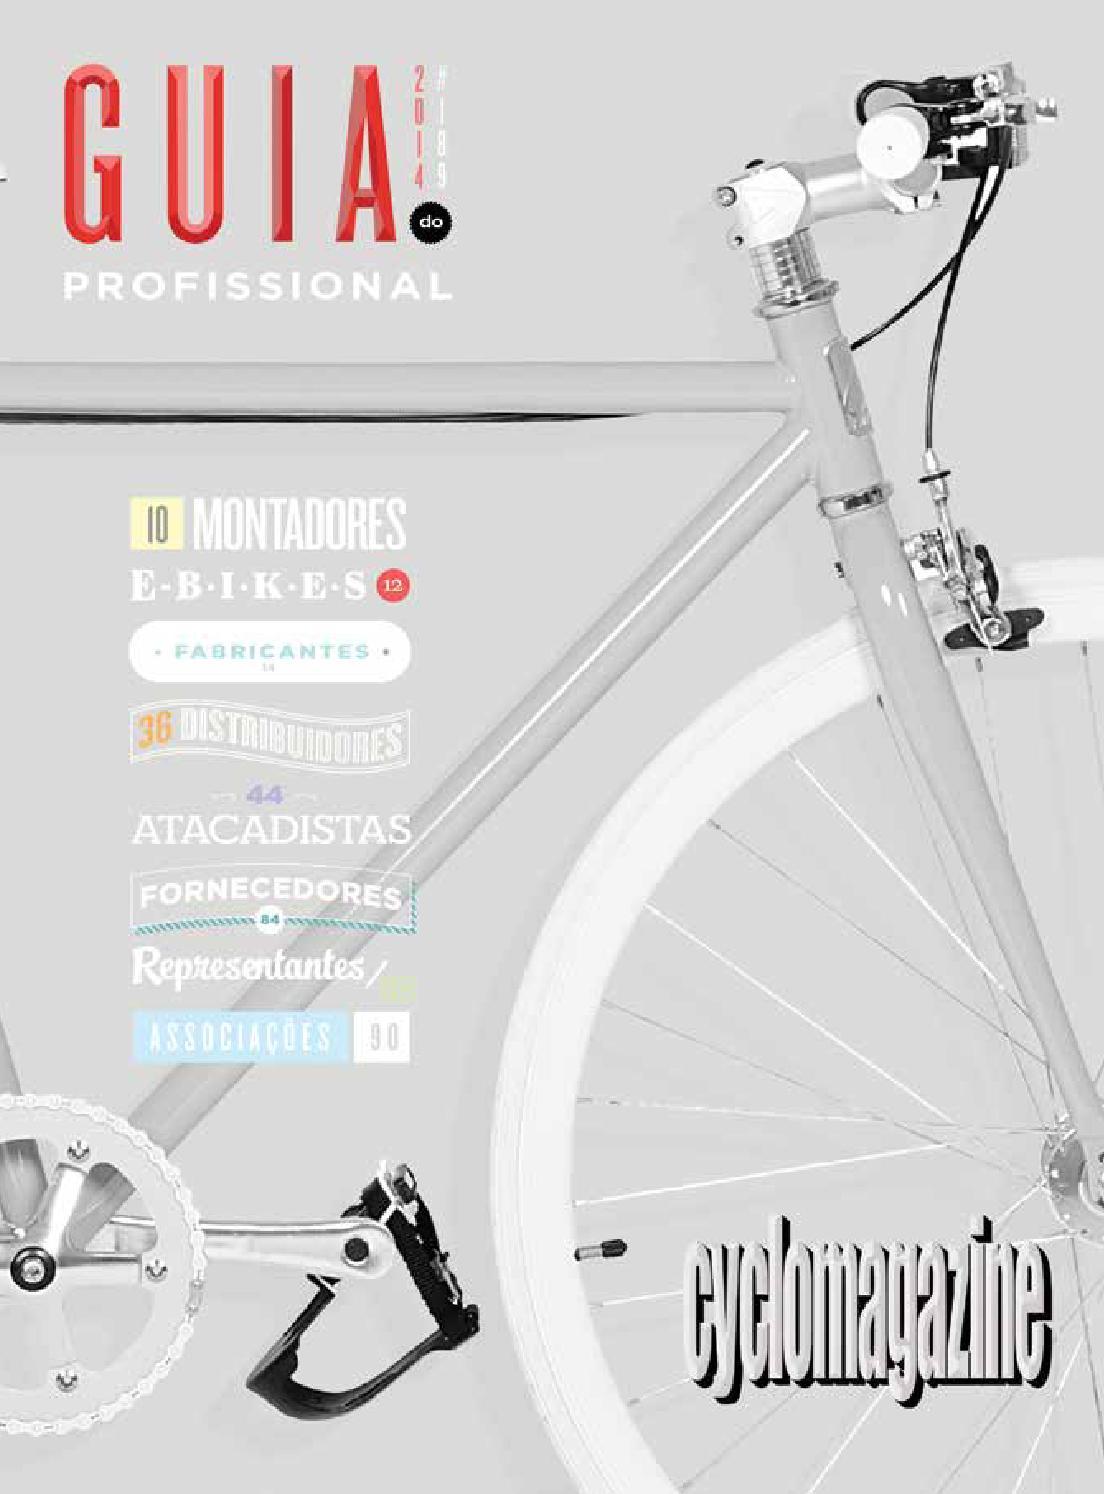 238b0e166 Guia Cyclomagazine do Profissional 2013 2014 by Luanda Editores - issuu